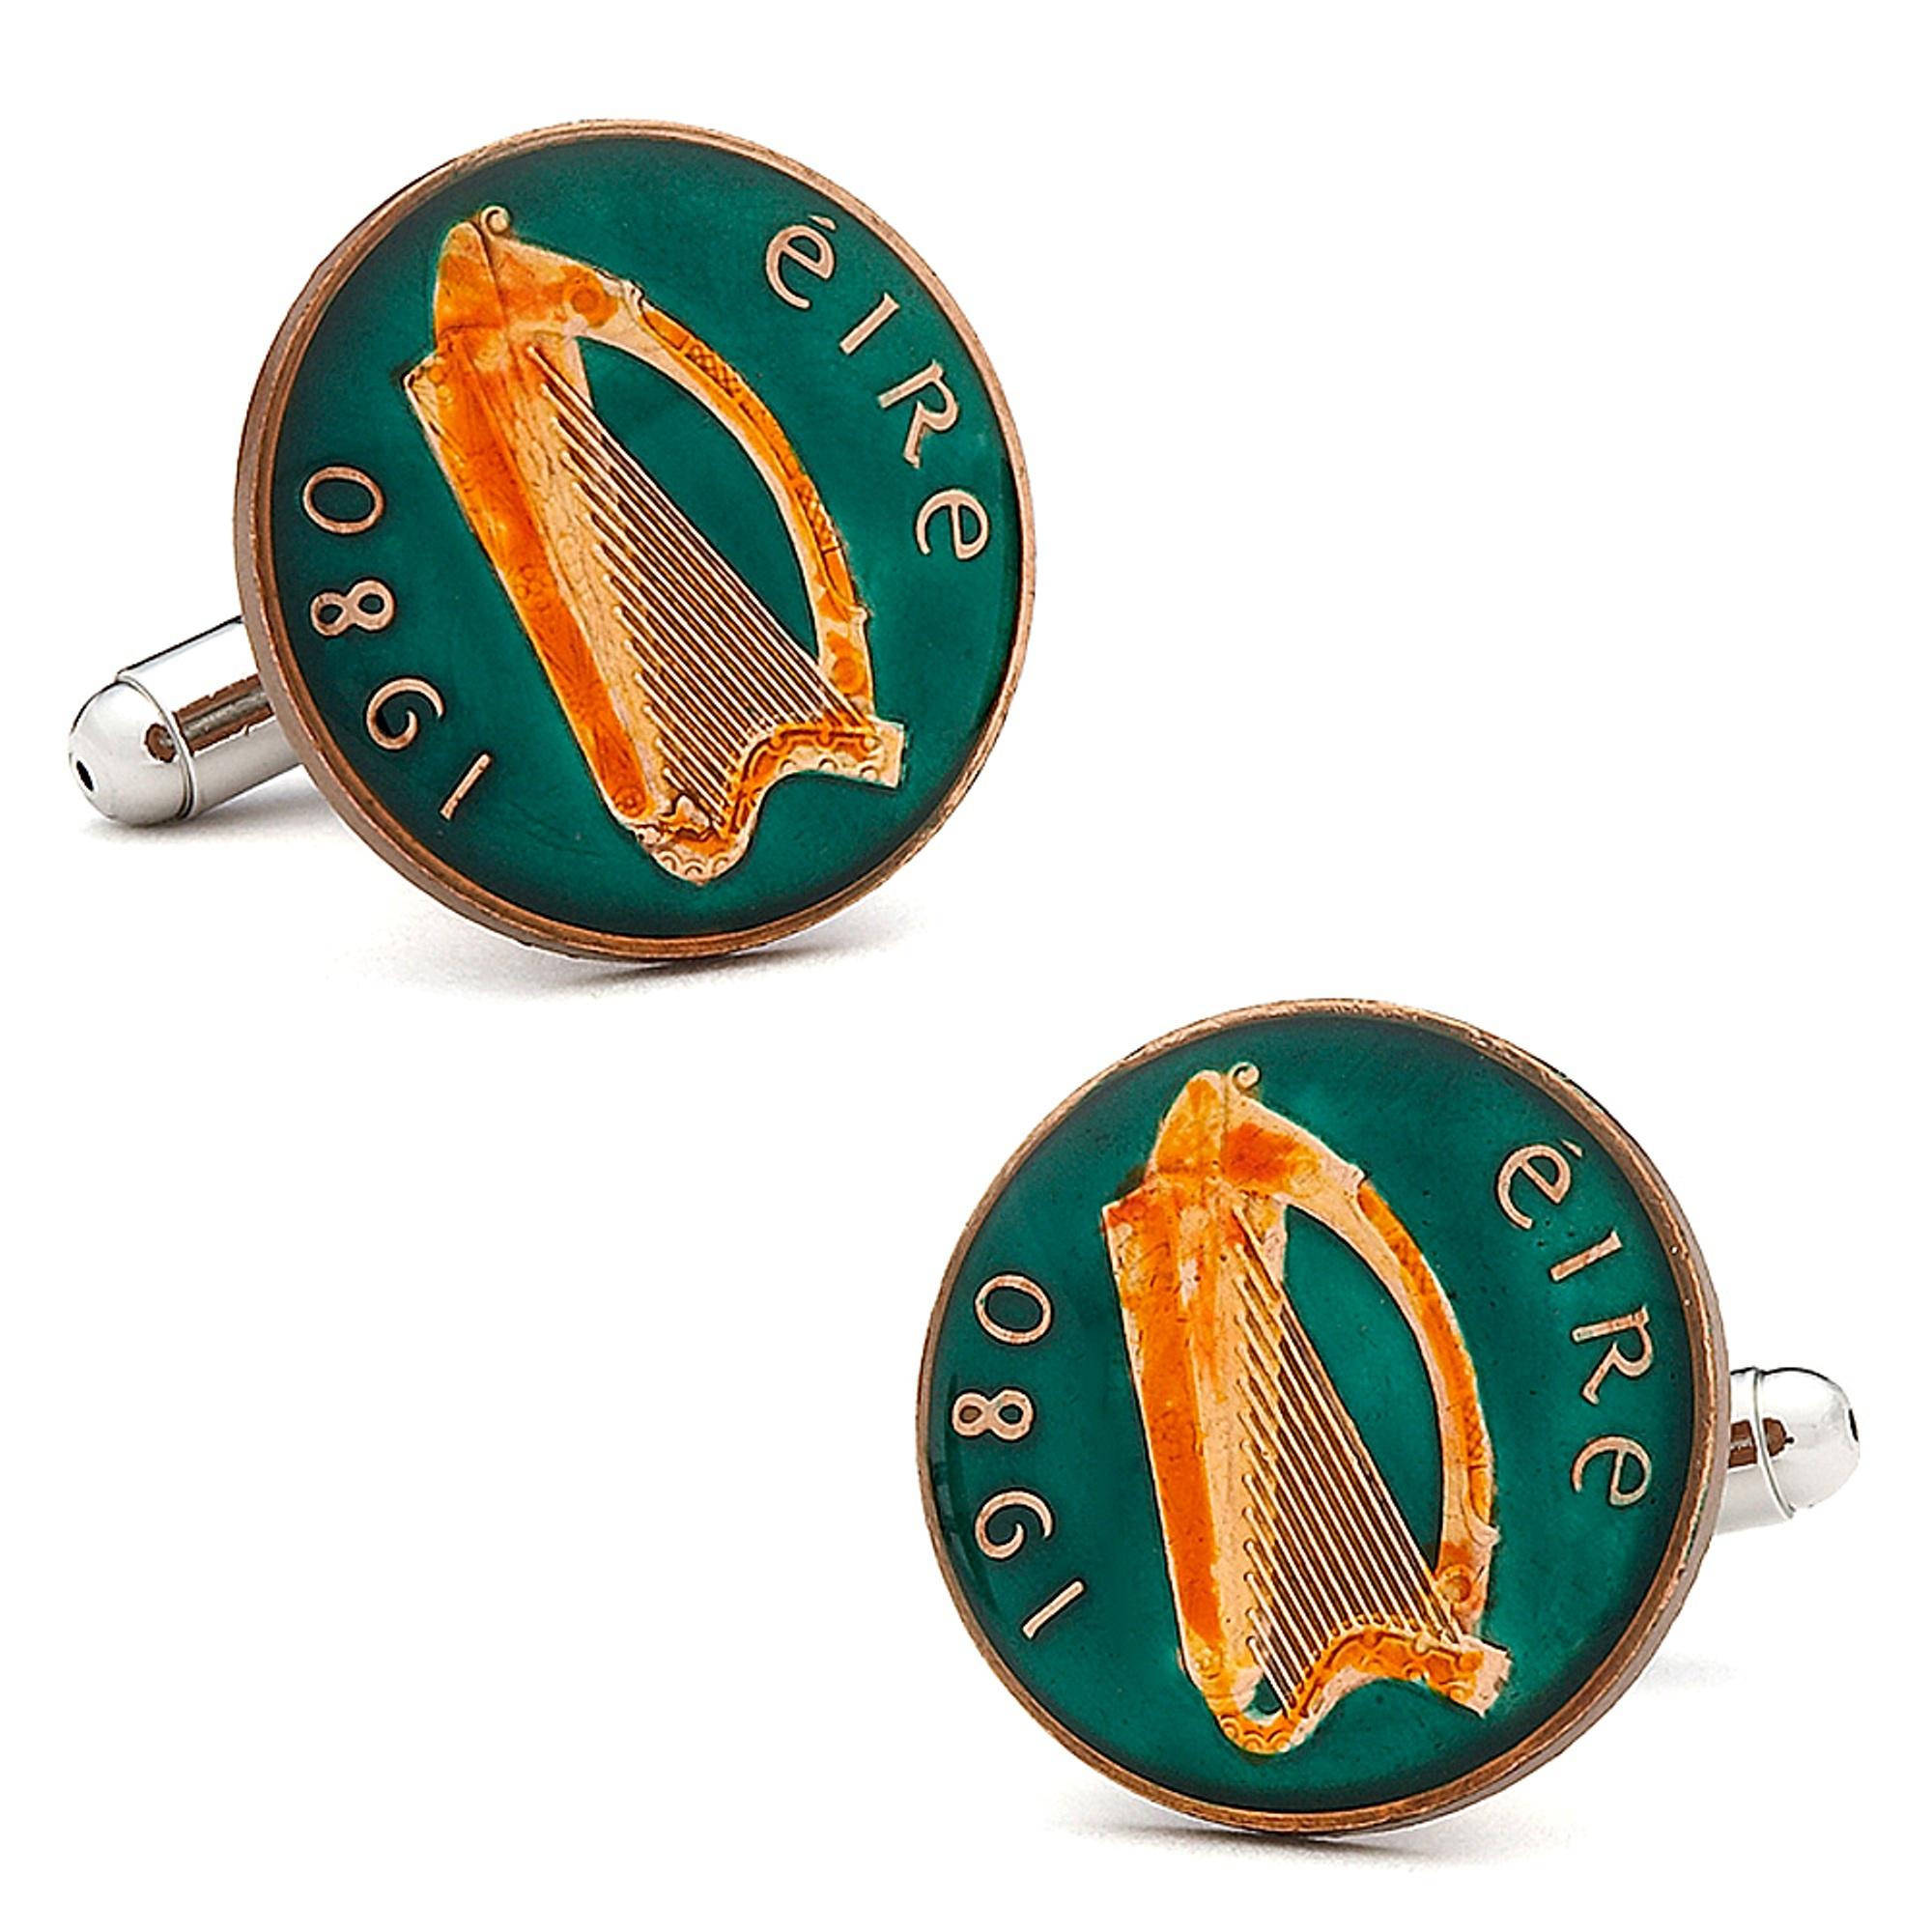 Penny Black 40 Mens Hand Painted Irish Eire Coin Cufflink...